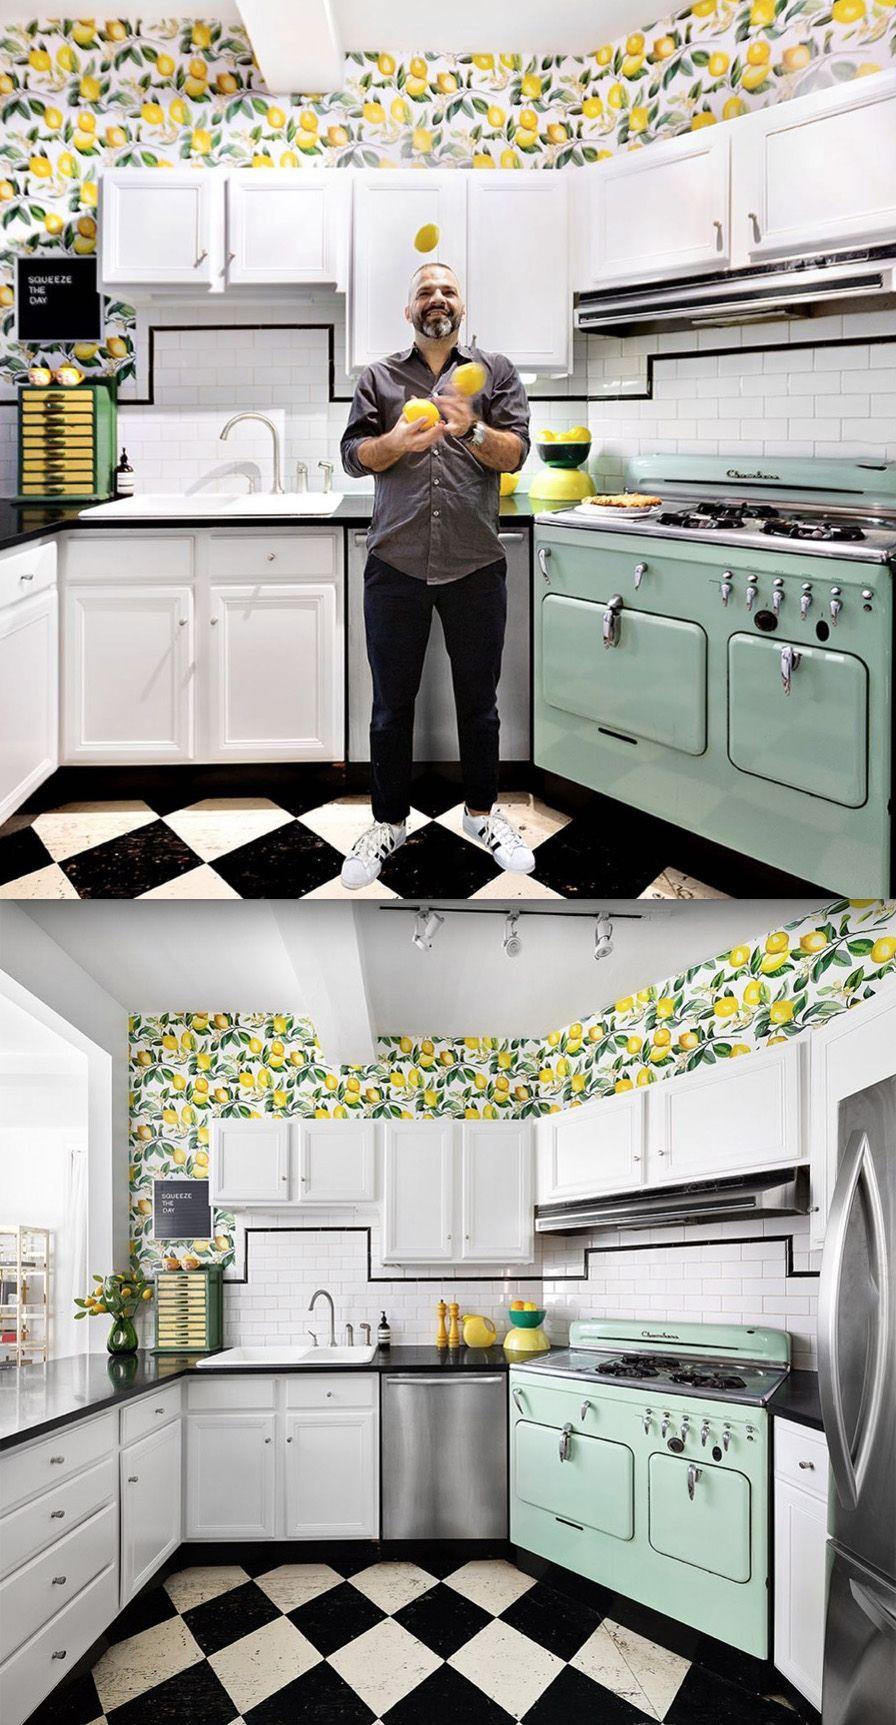 Lemon Zest Peel And Stick Wallpaper Peel And Stick Wallpaper Room Visualizer Dorm Furniture